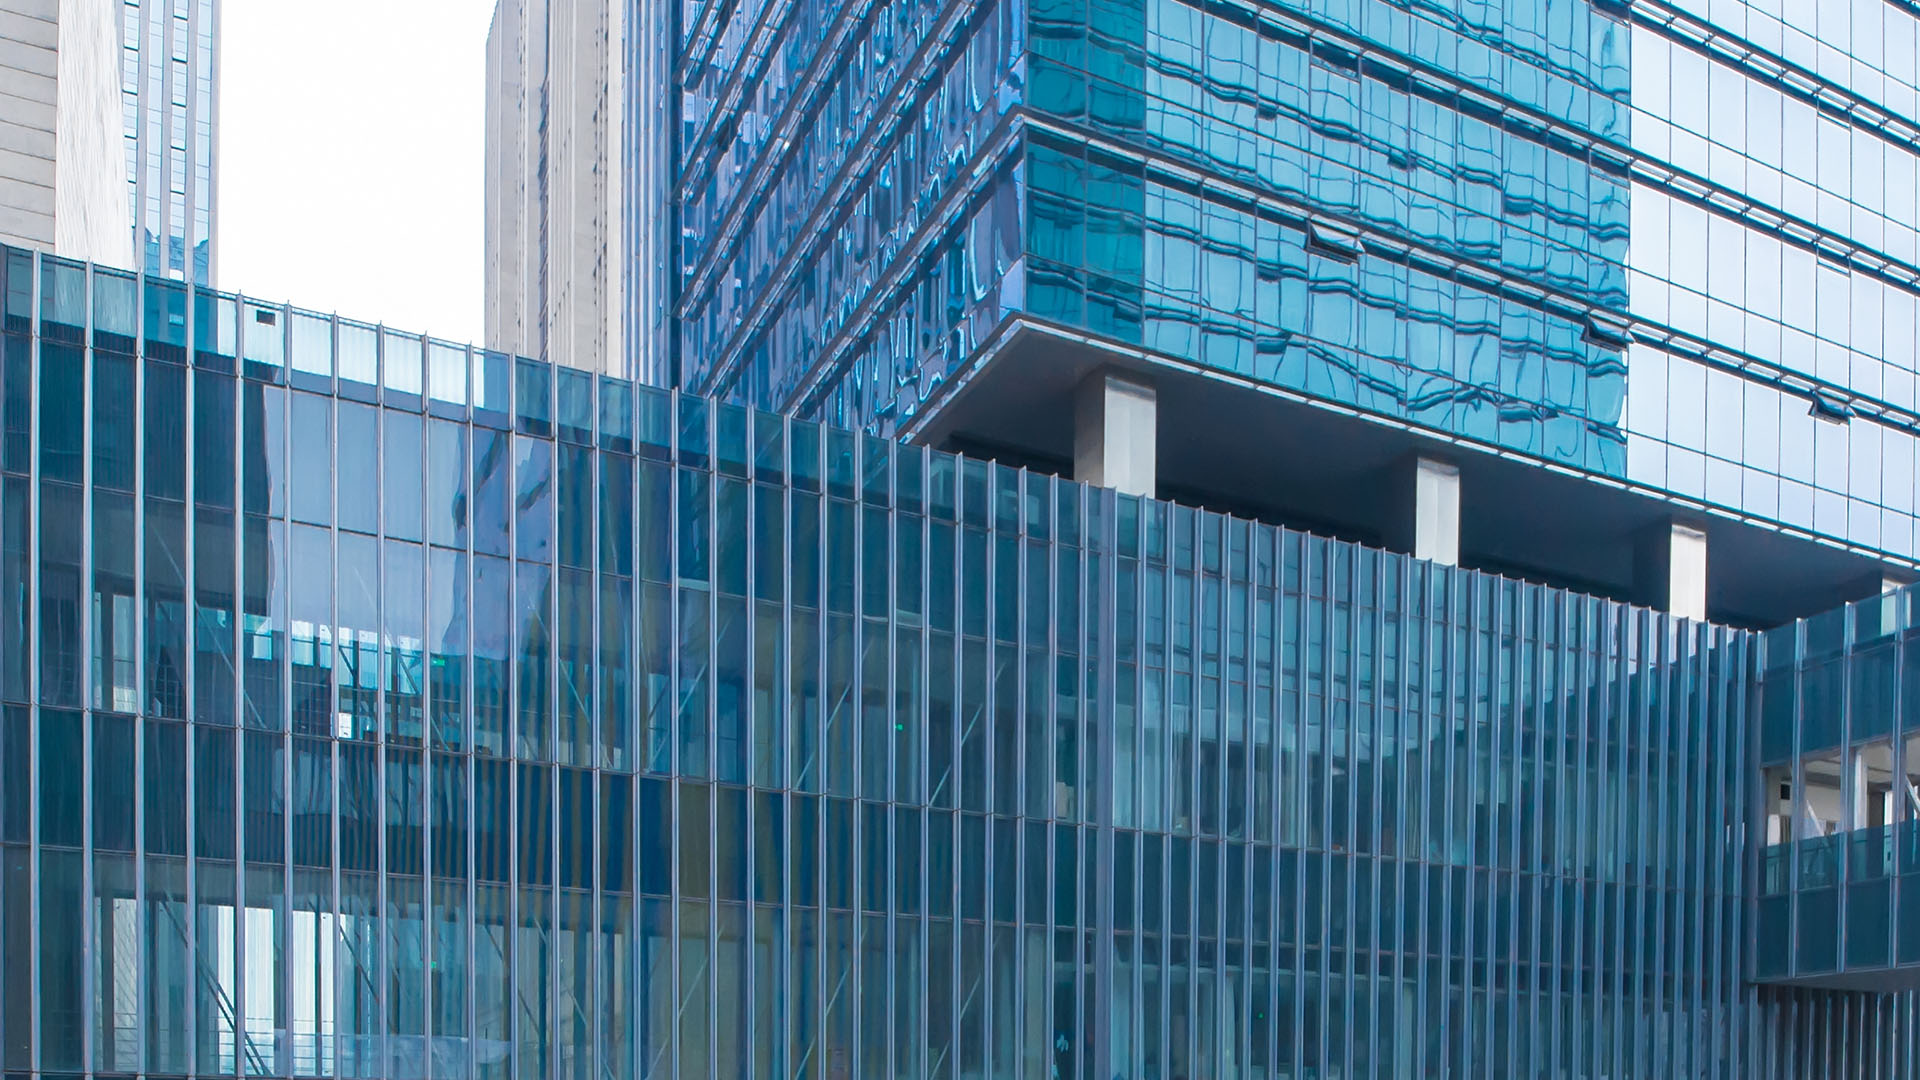 exterior view of office building walkway